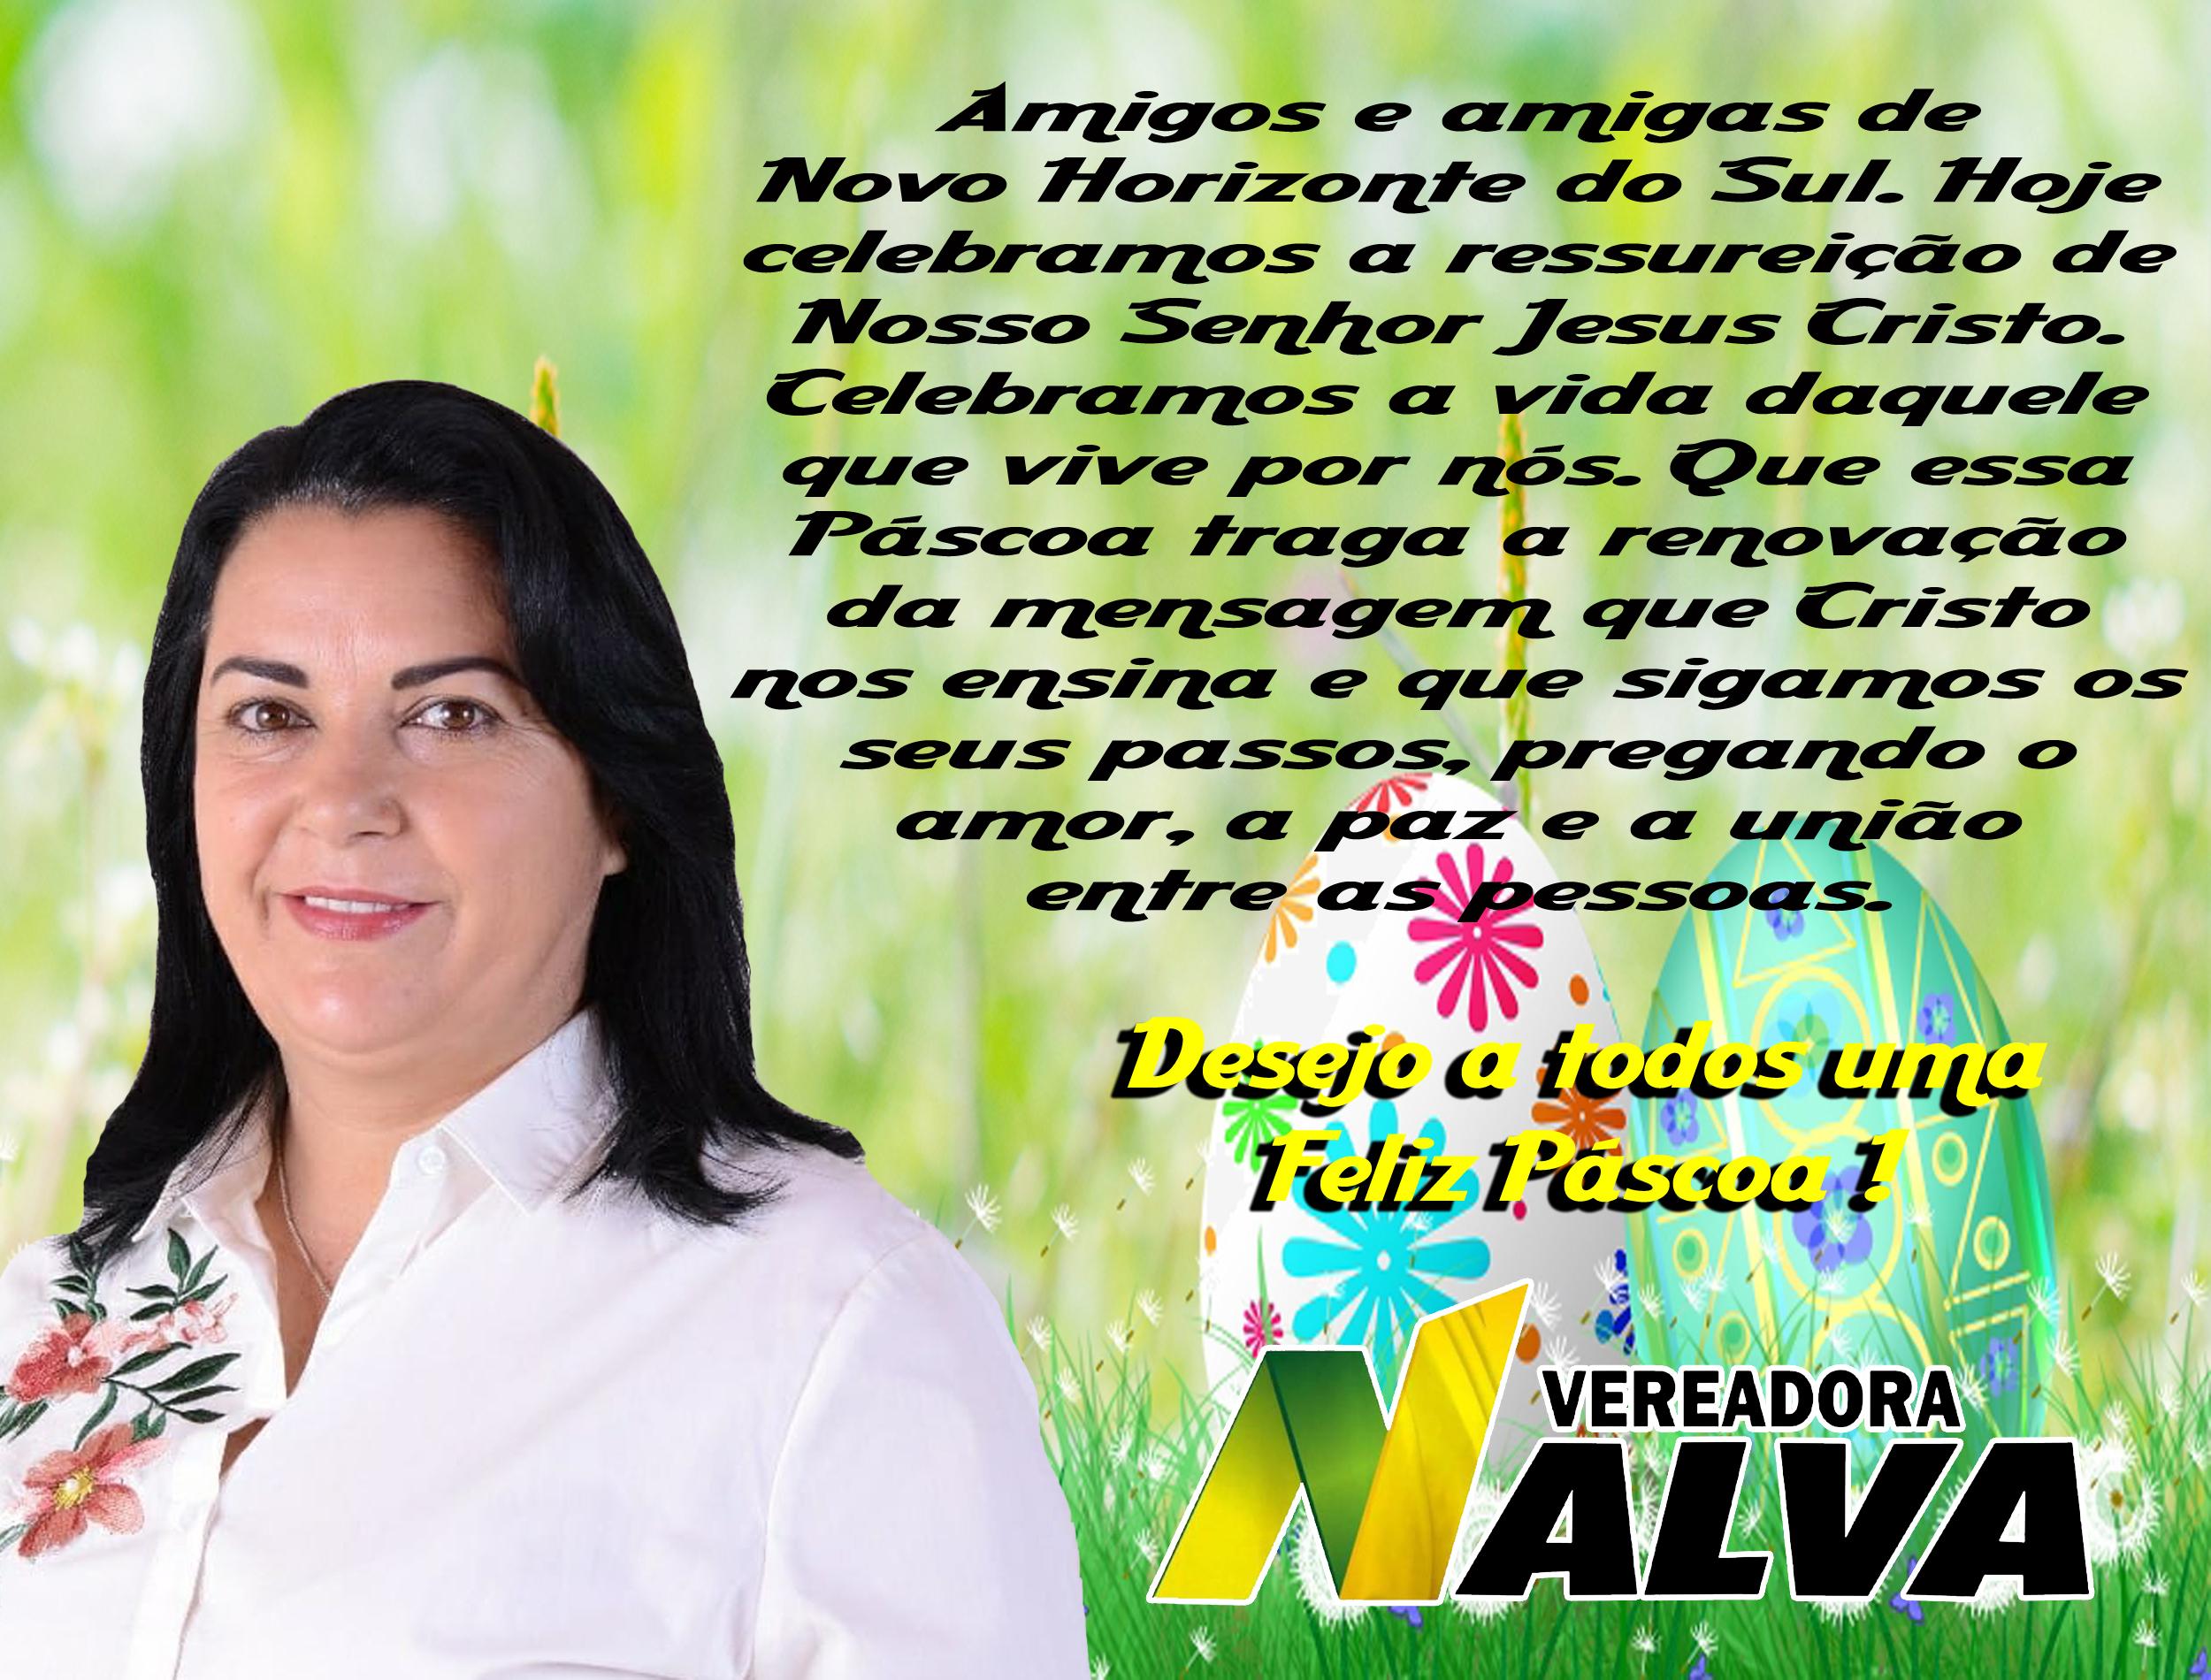 Mensagem de Pascoa da Vereadora Nalva a todos Novo Horizontinos